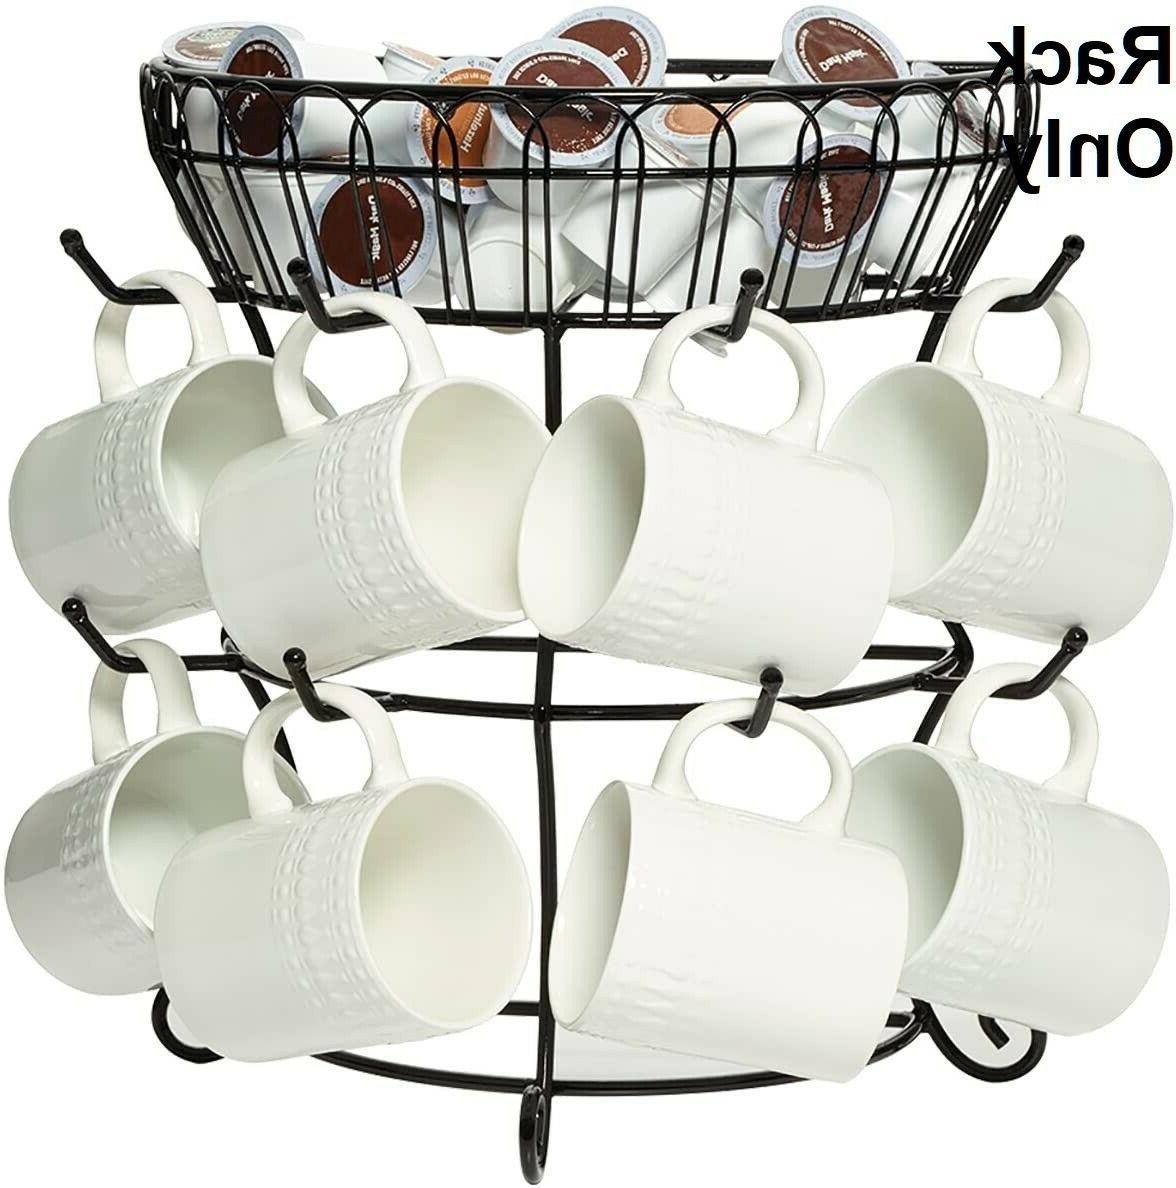 Wrought Iron 8 Mugs Tree W/Storage Basket Coffee Tea Pods Ra